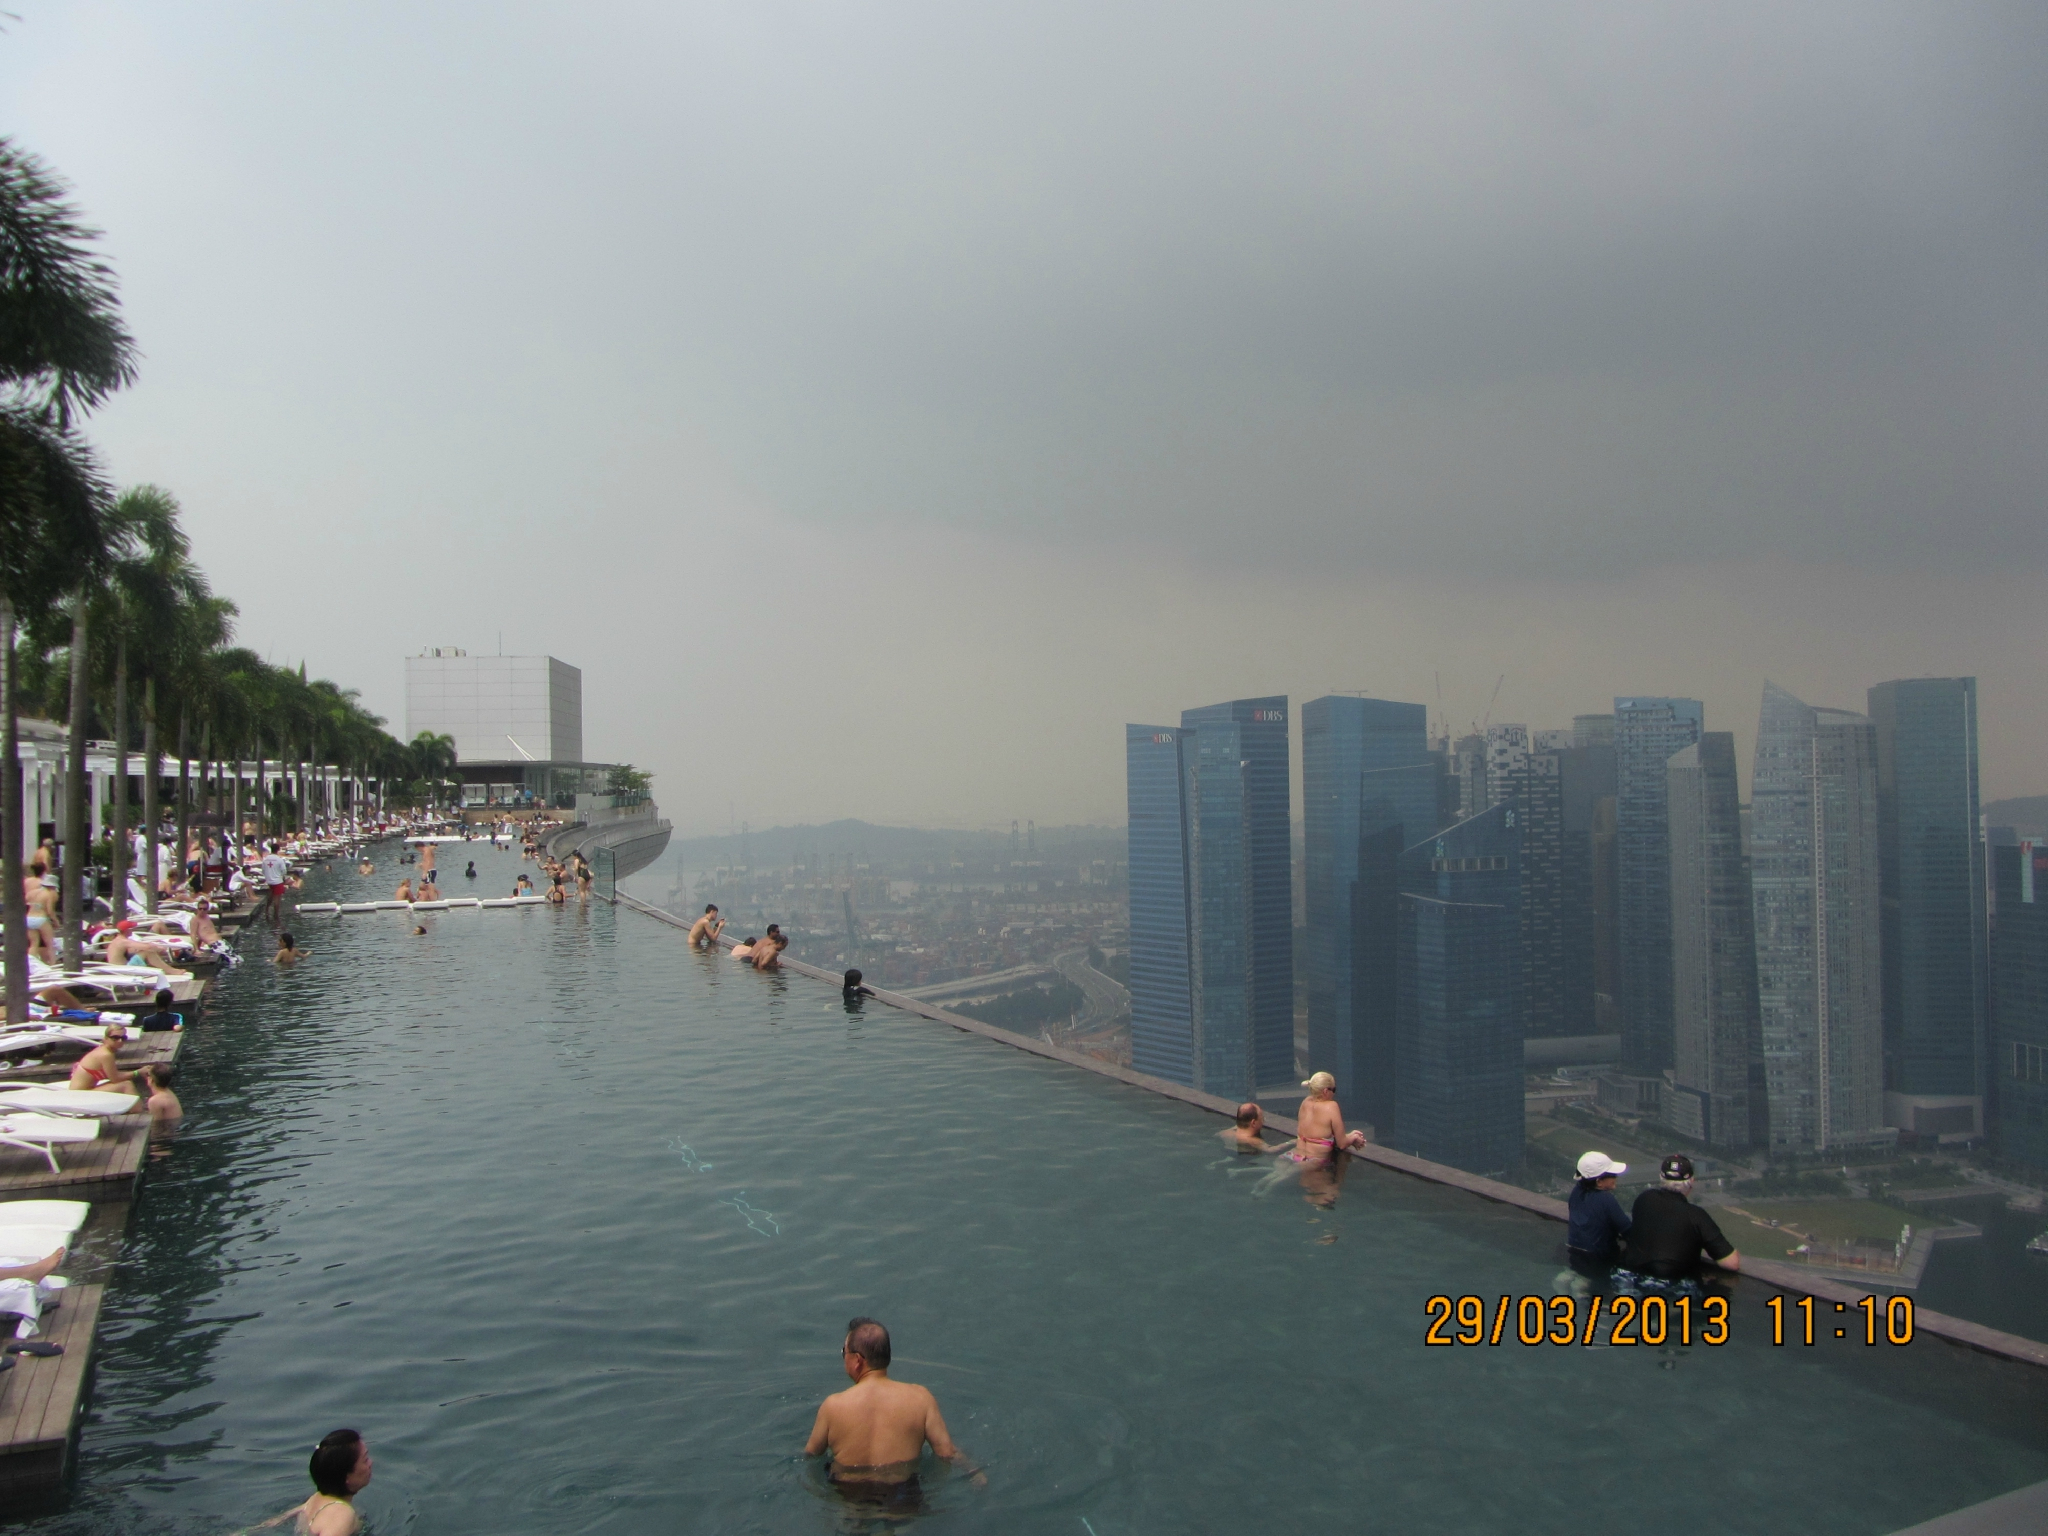 Singapour - Malacca - Around The World Blog Mb à Piscine Singapour